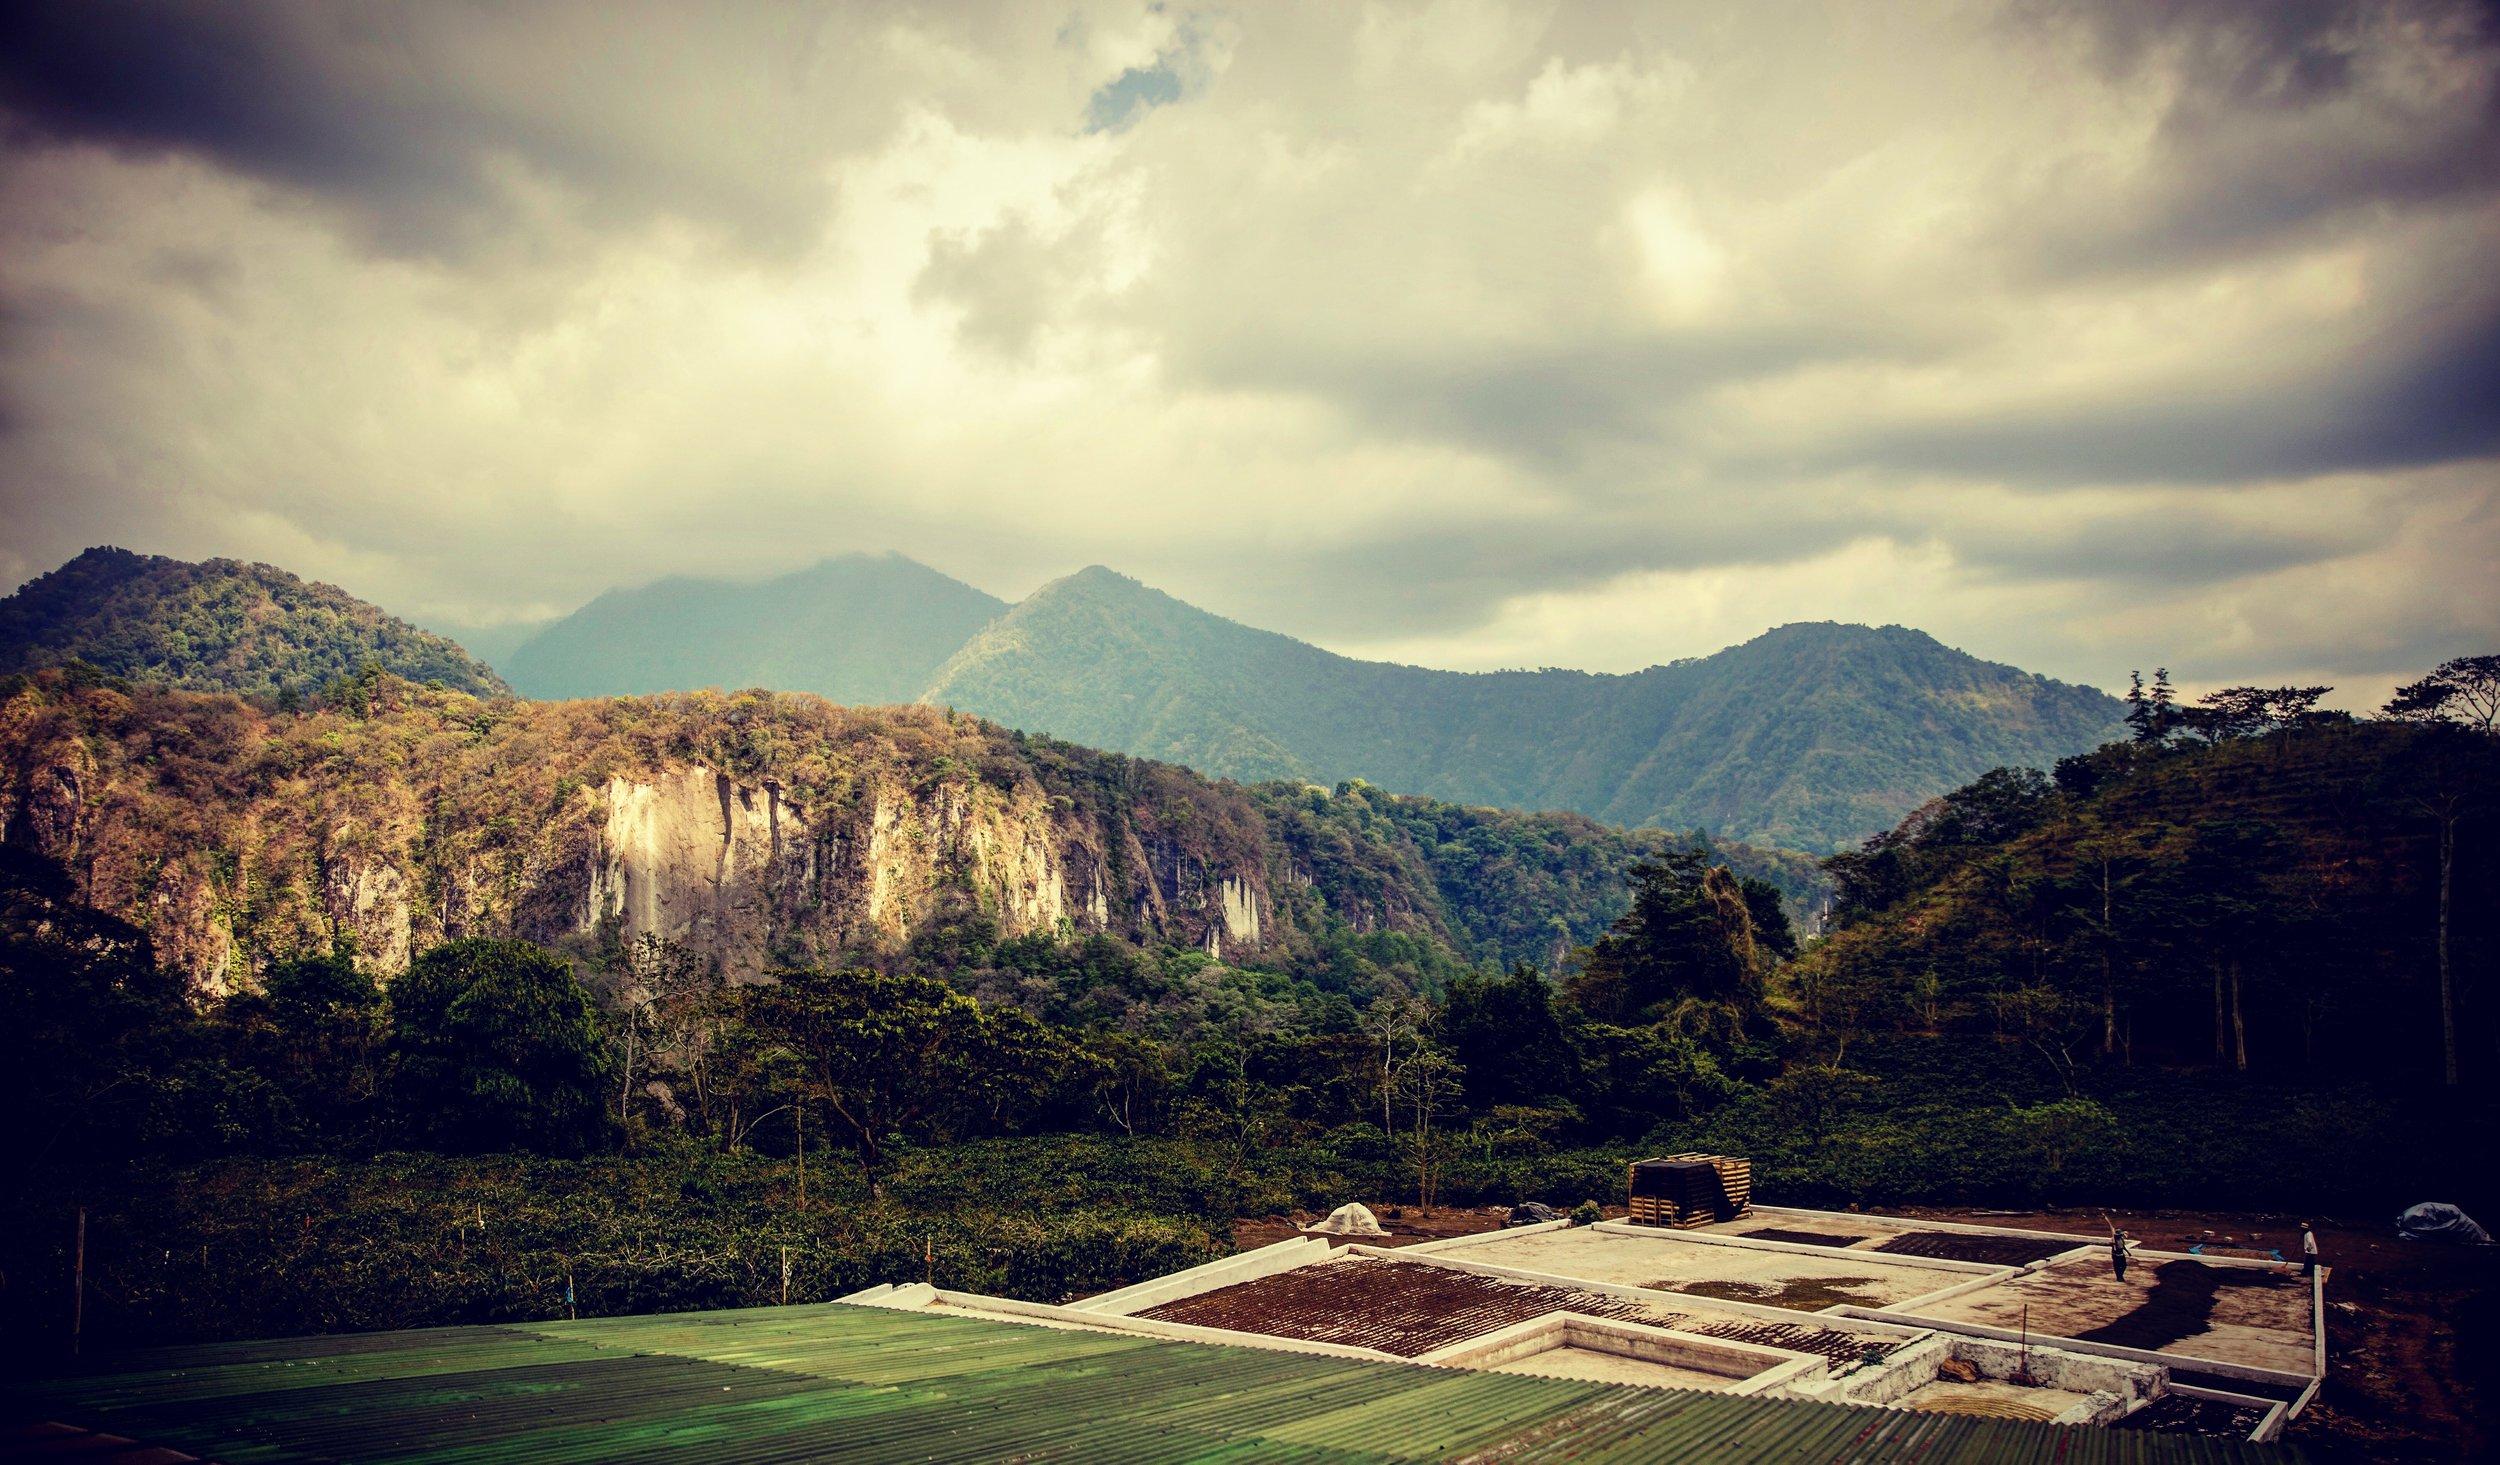 Santo Tomas Pachuj - Guatemala